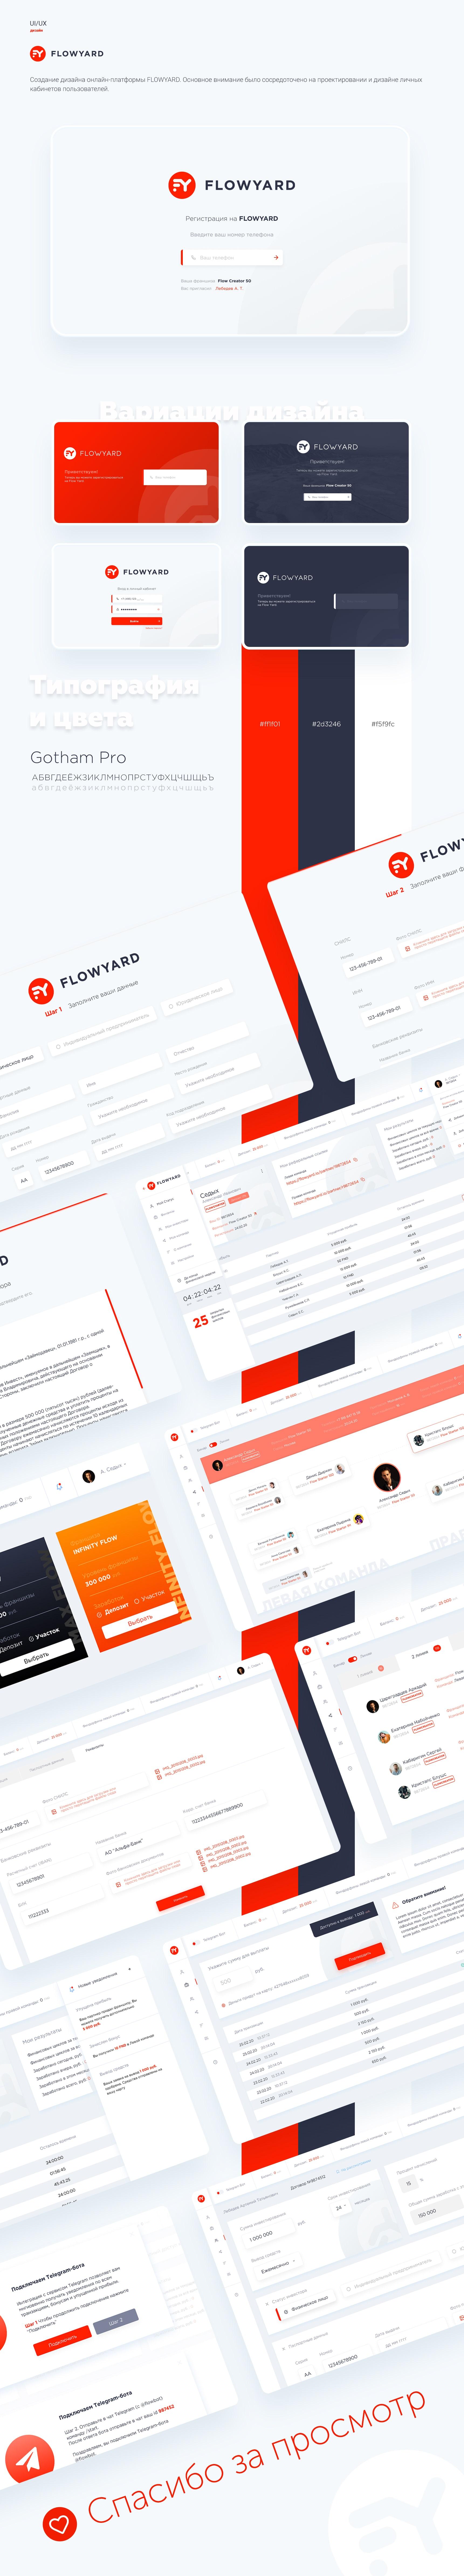 Flowyard - инвестиционная онлайн-платформа